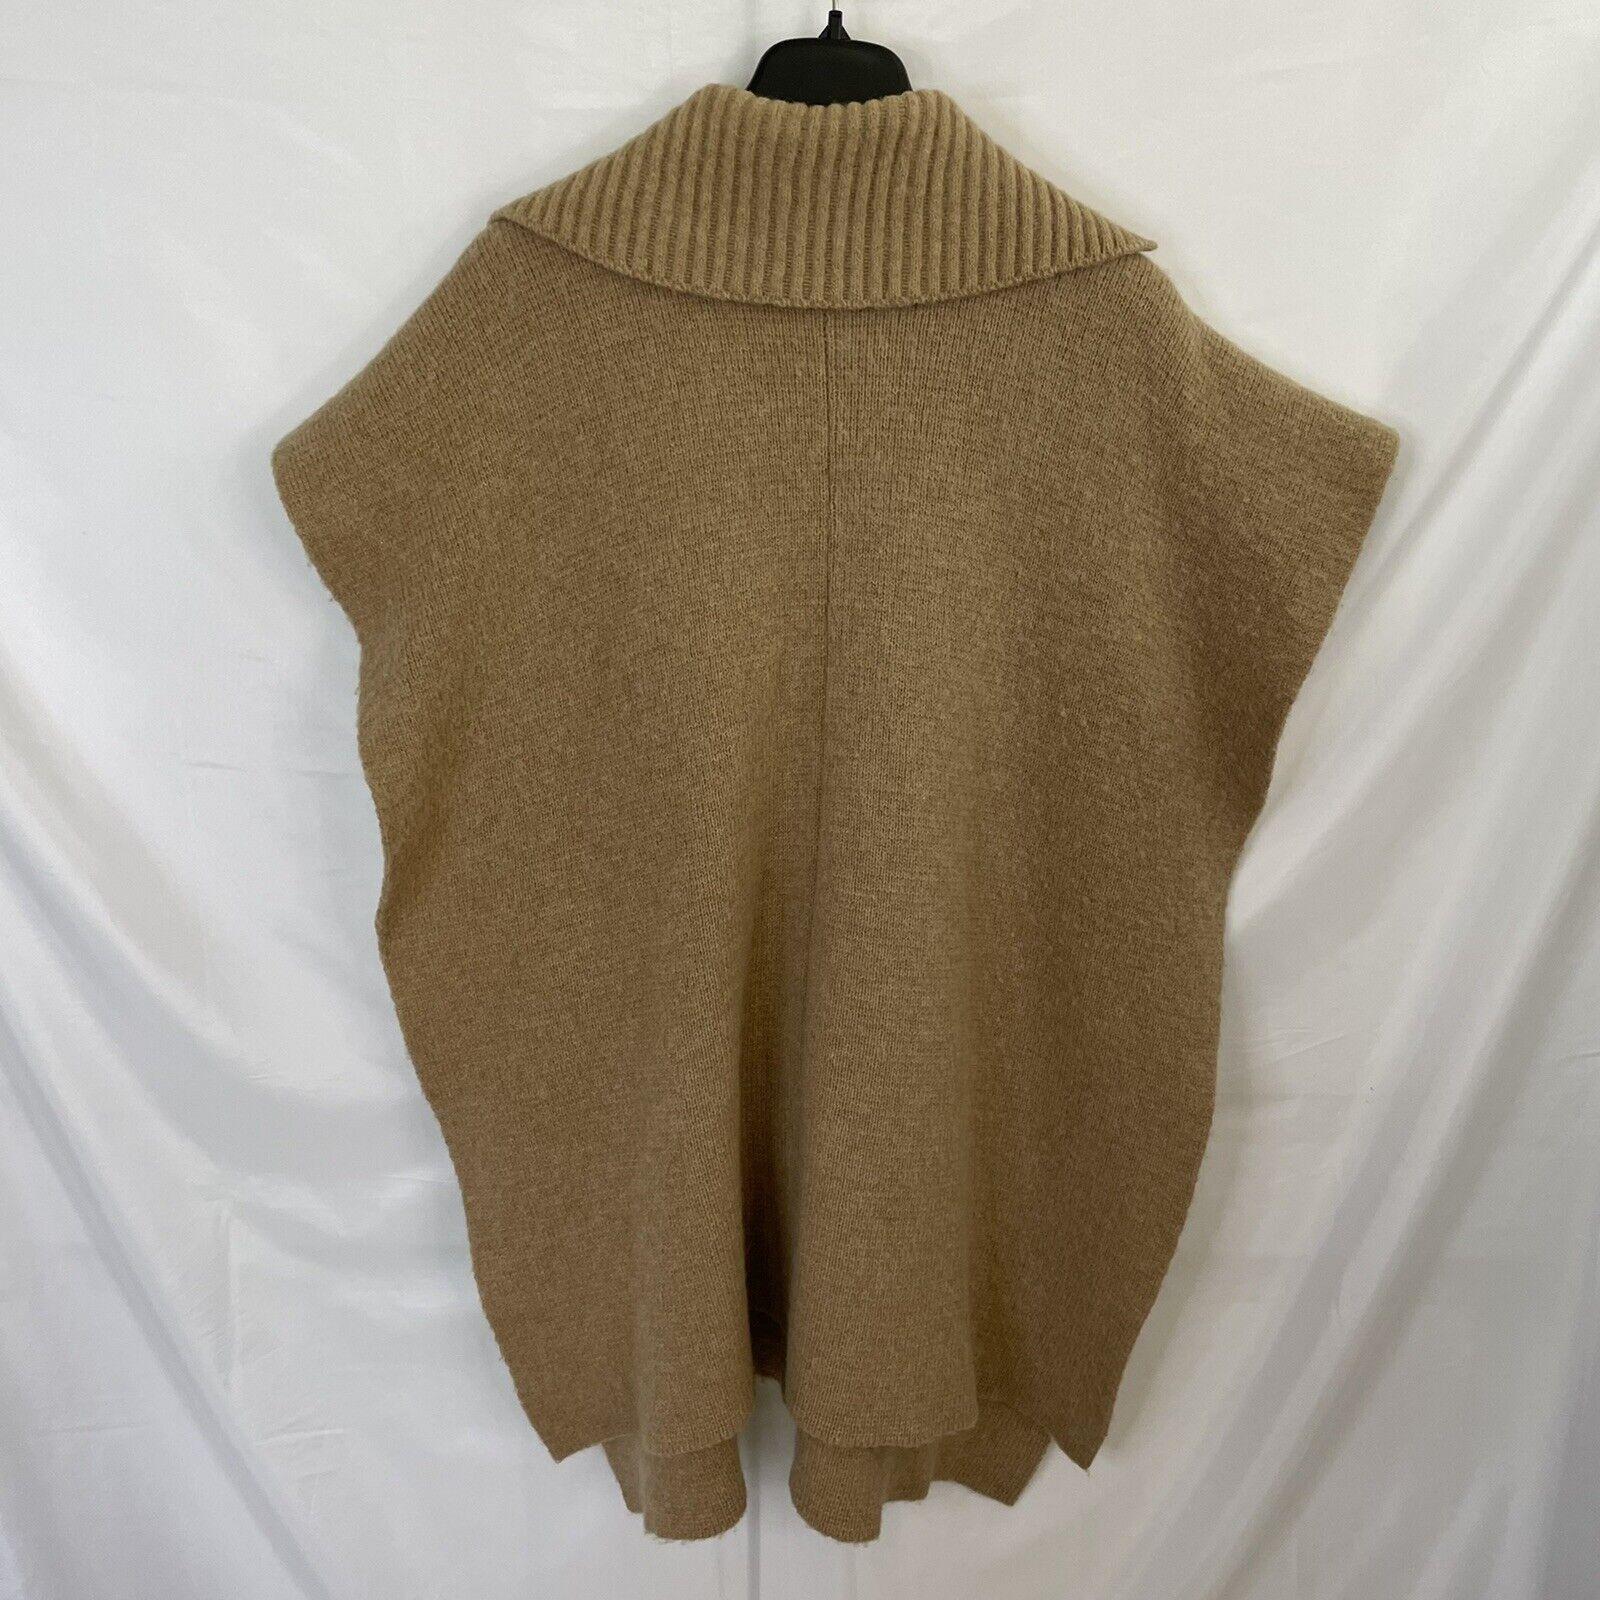 Bonnie Cashin Camel Knit Sweater Cape Poncho Coat - image 9